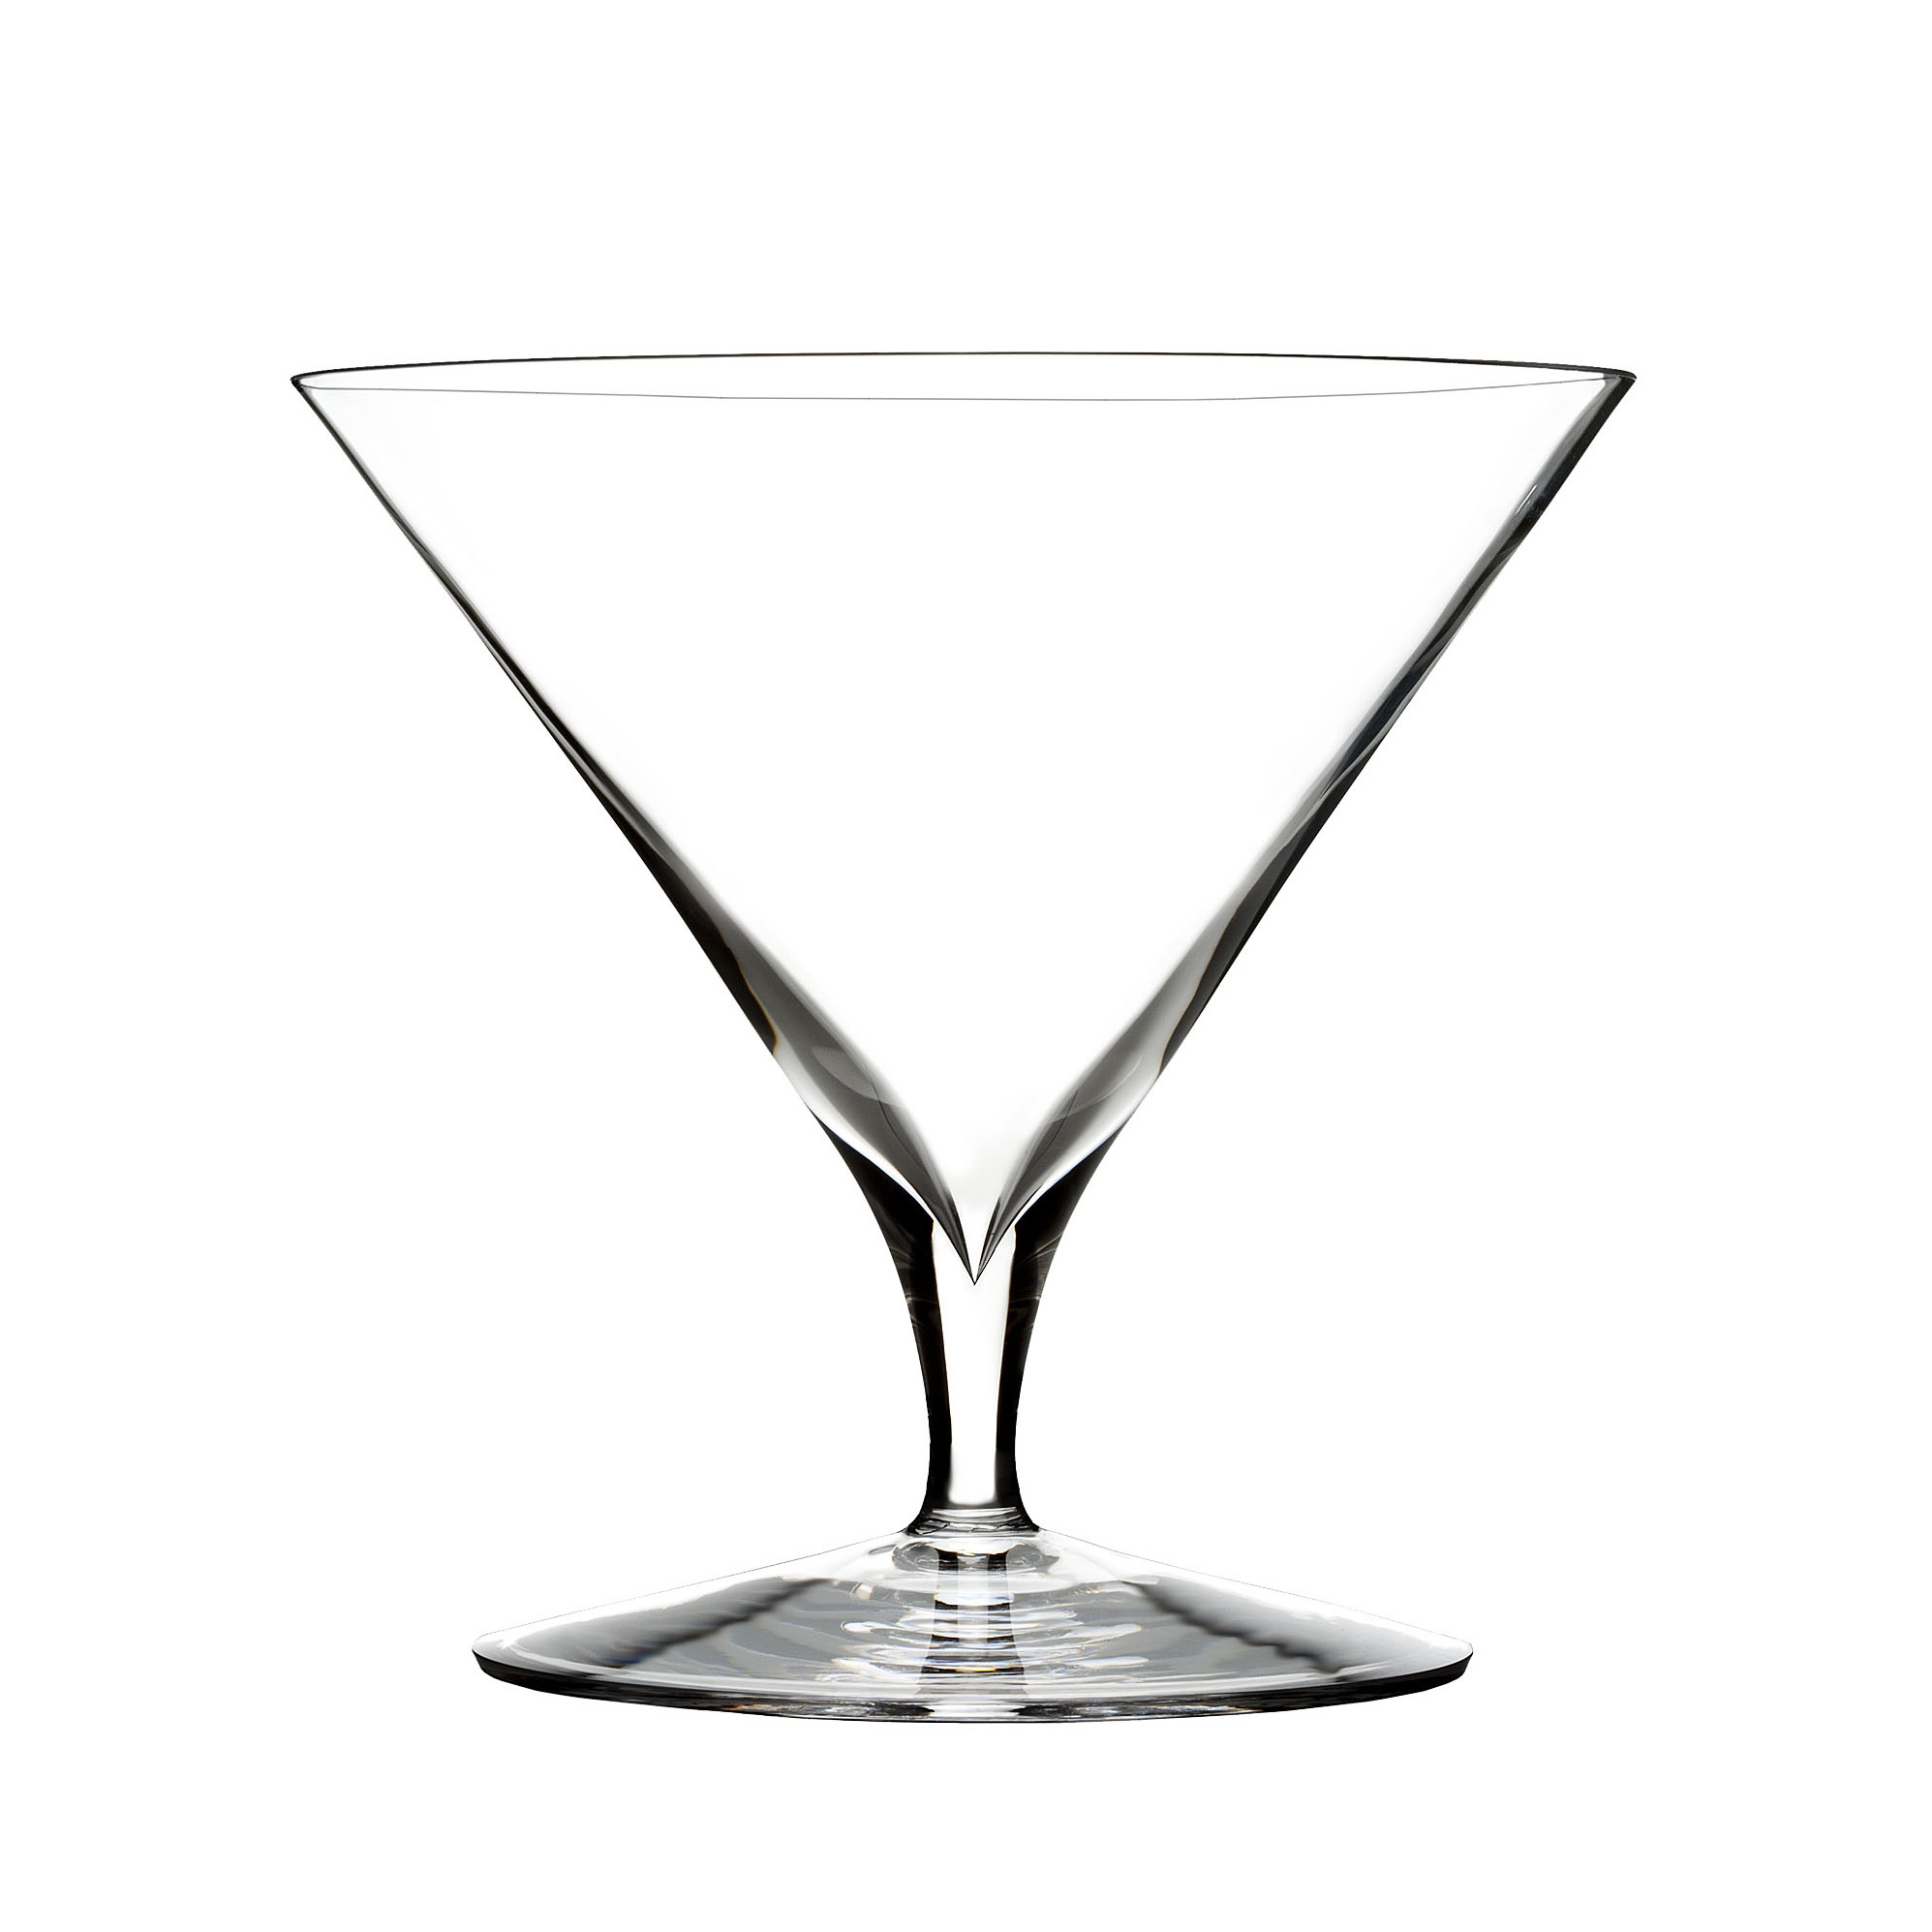 10 Best Martini Glasses In 2016 Unique Martini Glasses For Every Budget